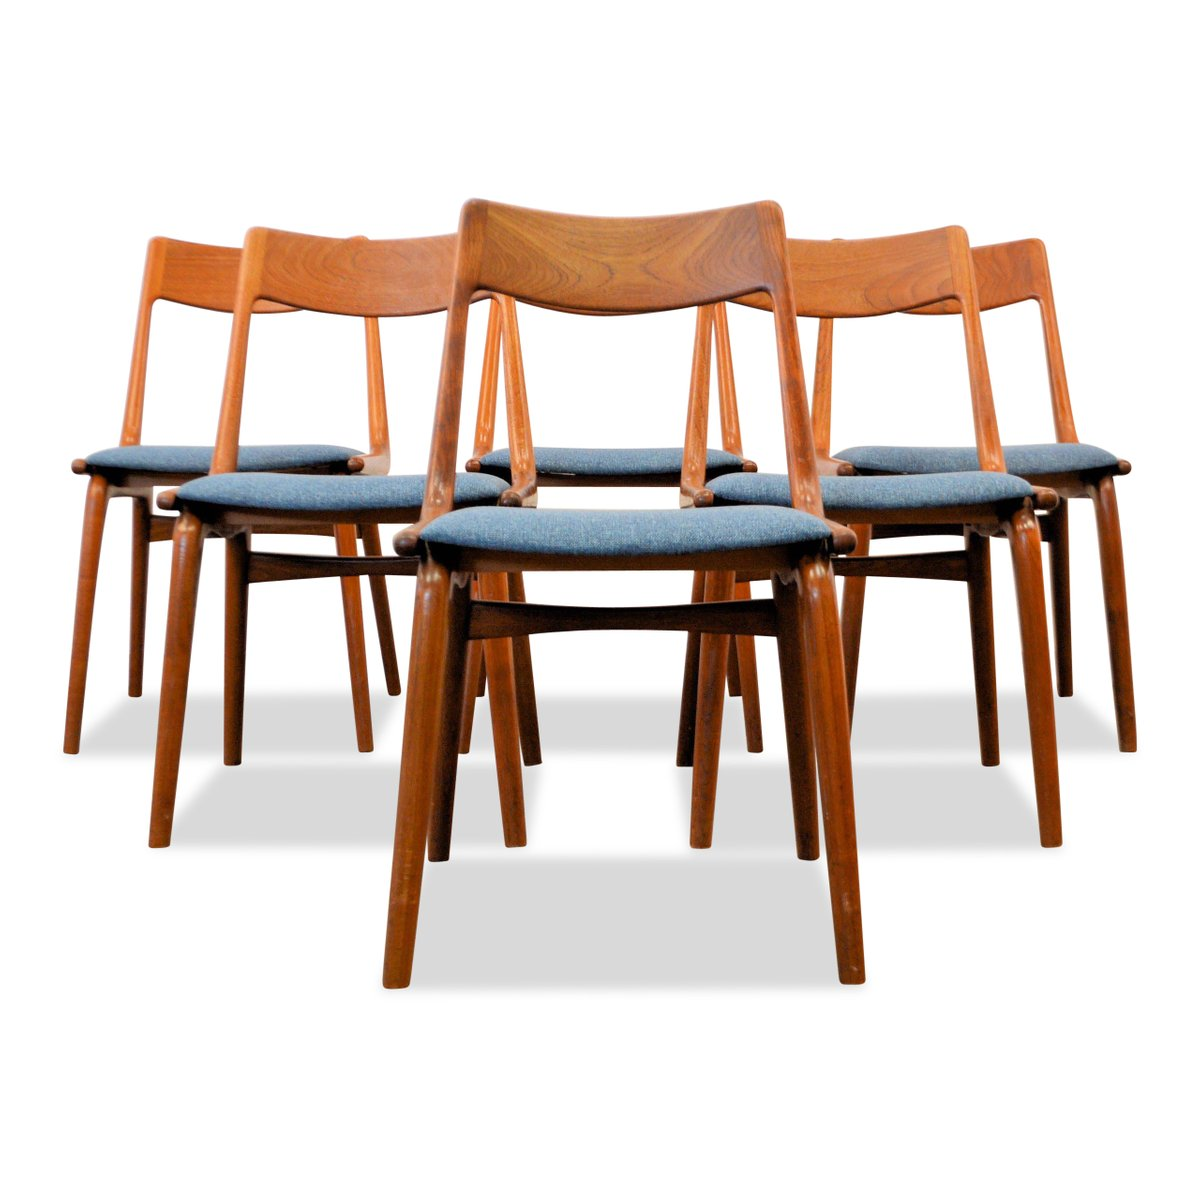 Delightful Mid Century Boomerang Dining Chairs By Alfred Christensen For Slagelse  Møbelværk, Set Of 6